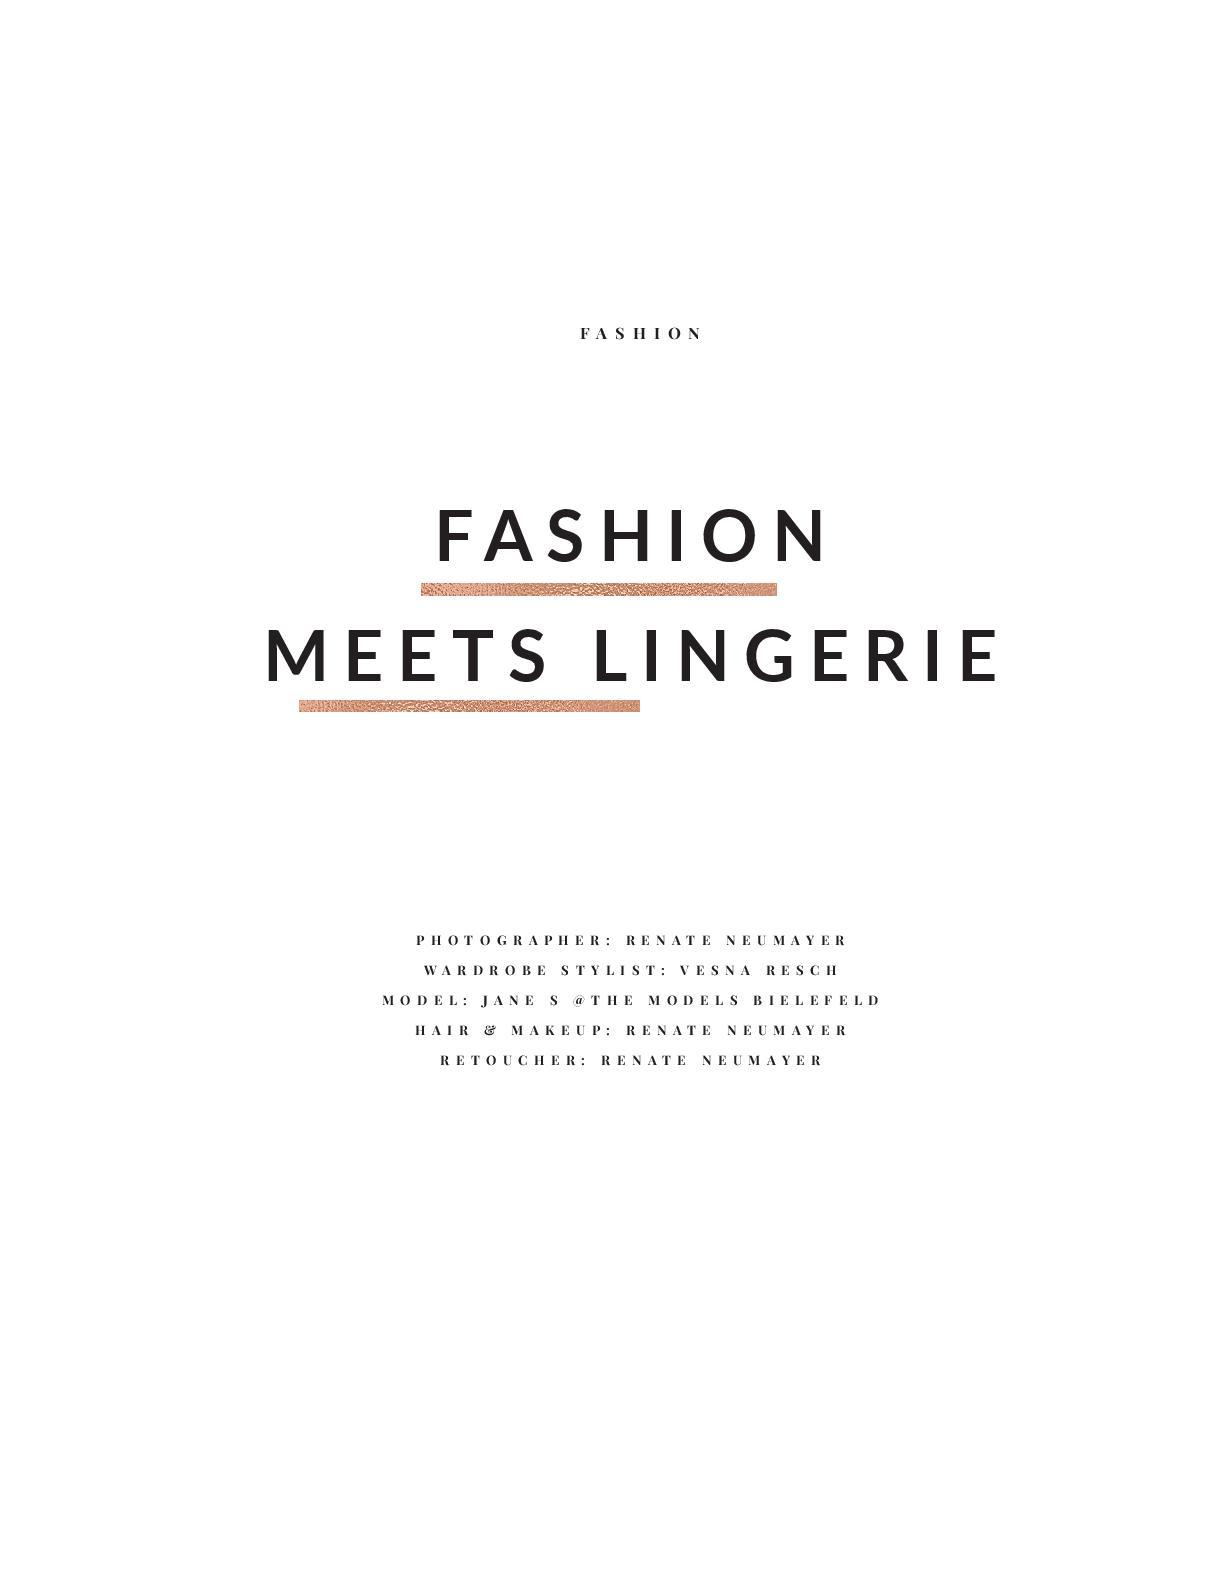 ELEGNAT NYC, August 2018 Vol. 50 No. 2 - Fashion Stylist: Vesna Resch